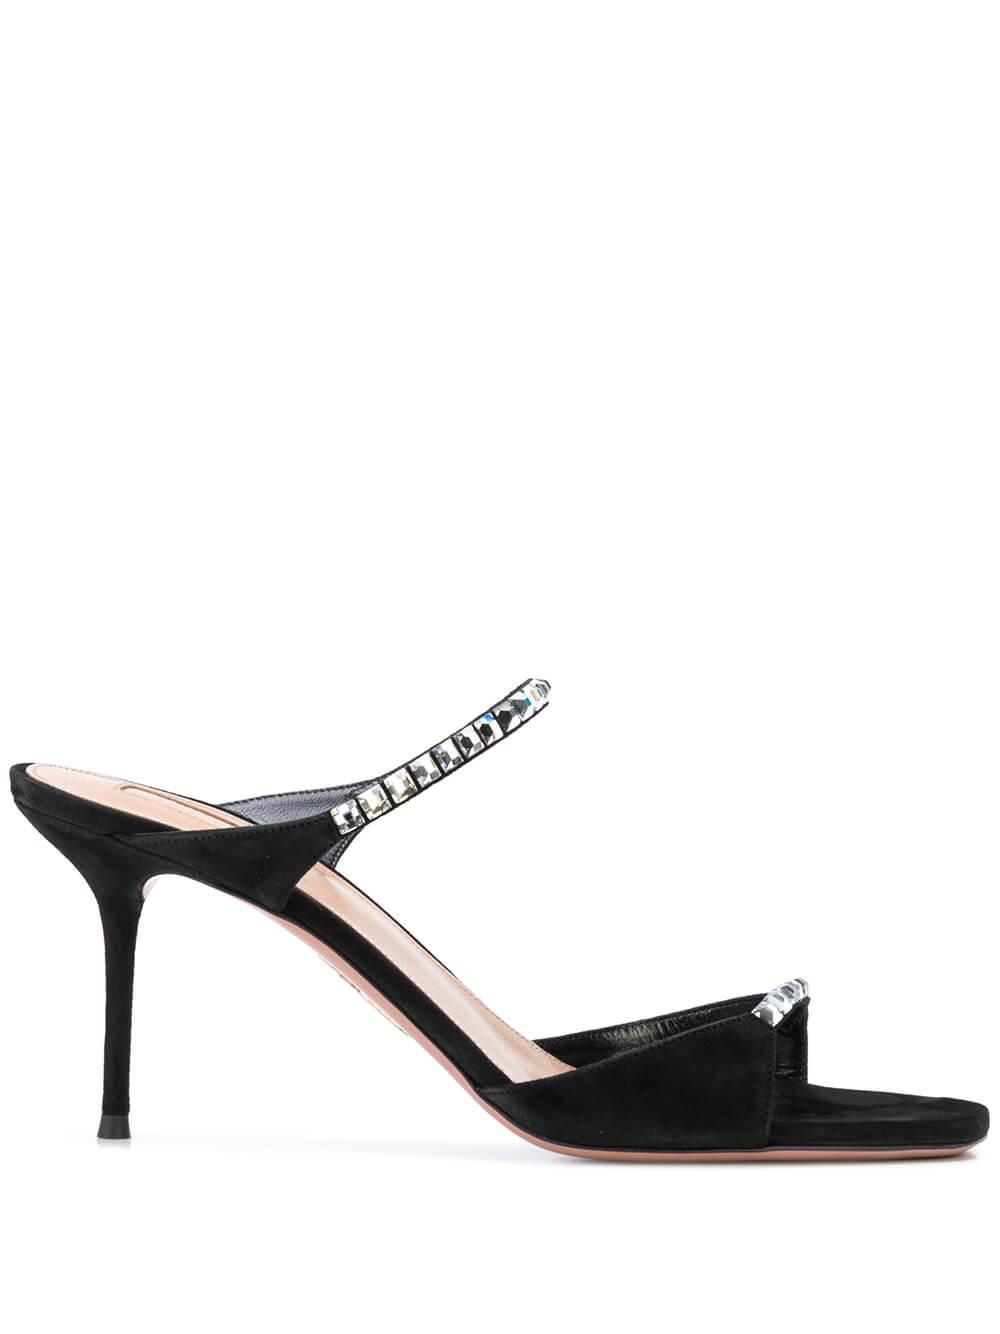 Diamante 75MM 2-Strap Suede Sandal